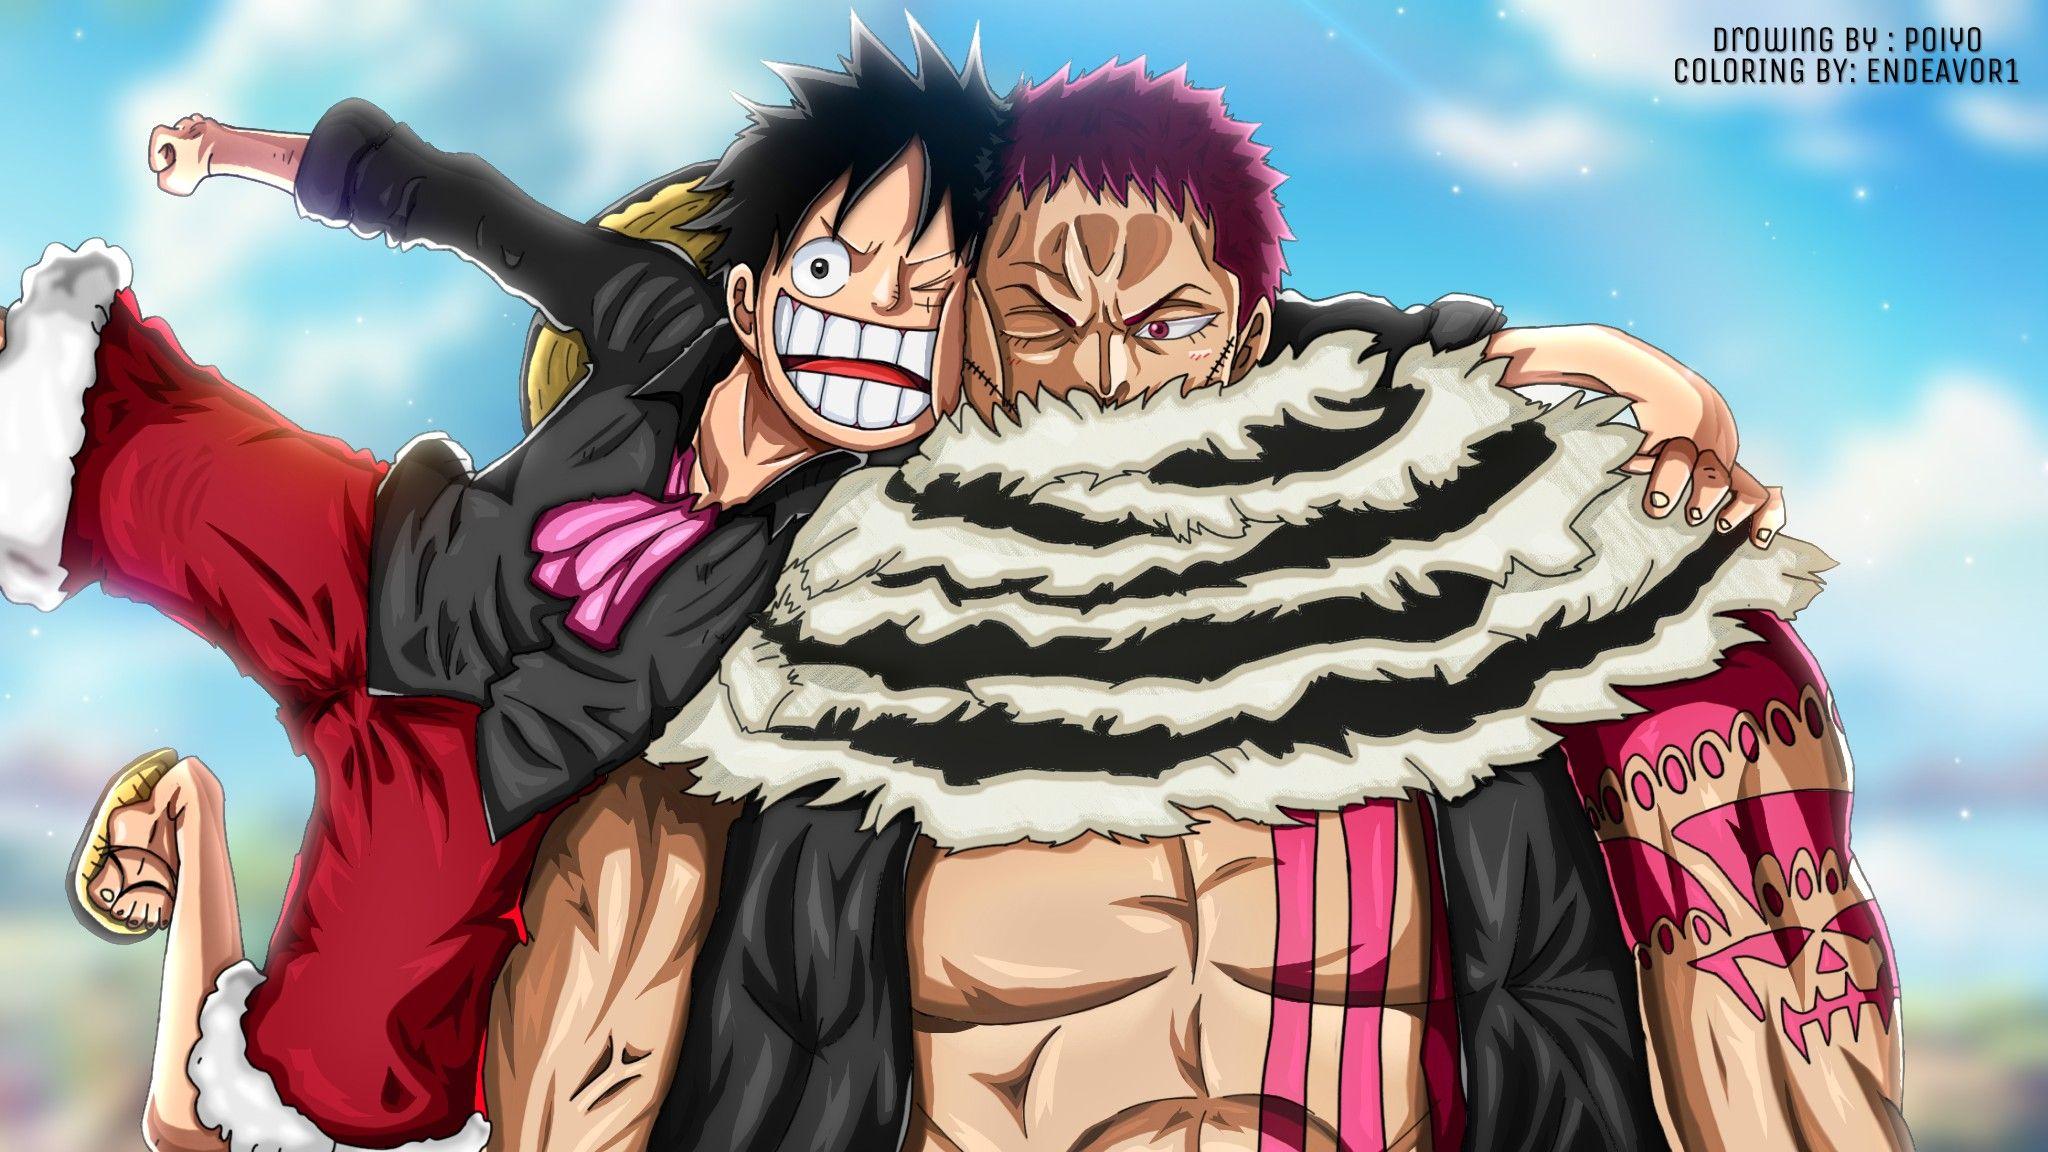 Luffy & Katakuri   One piece luffy, One piece manga, One piece anime